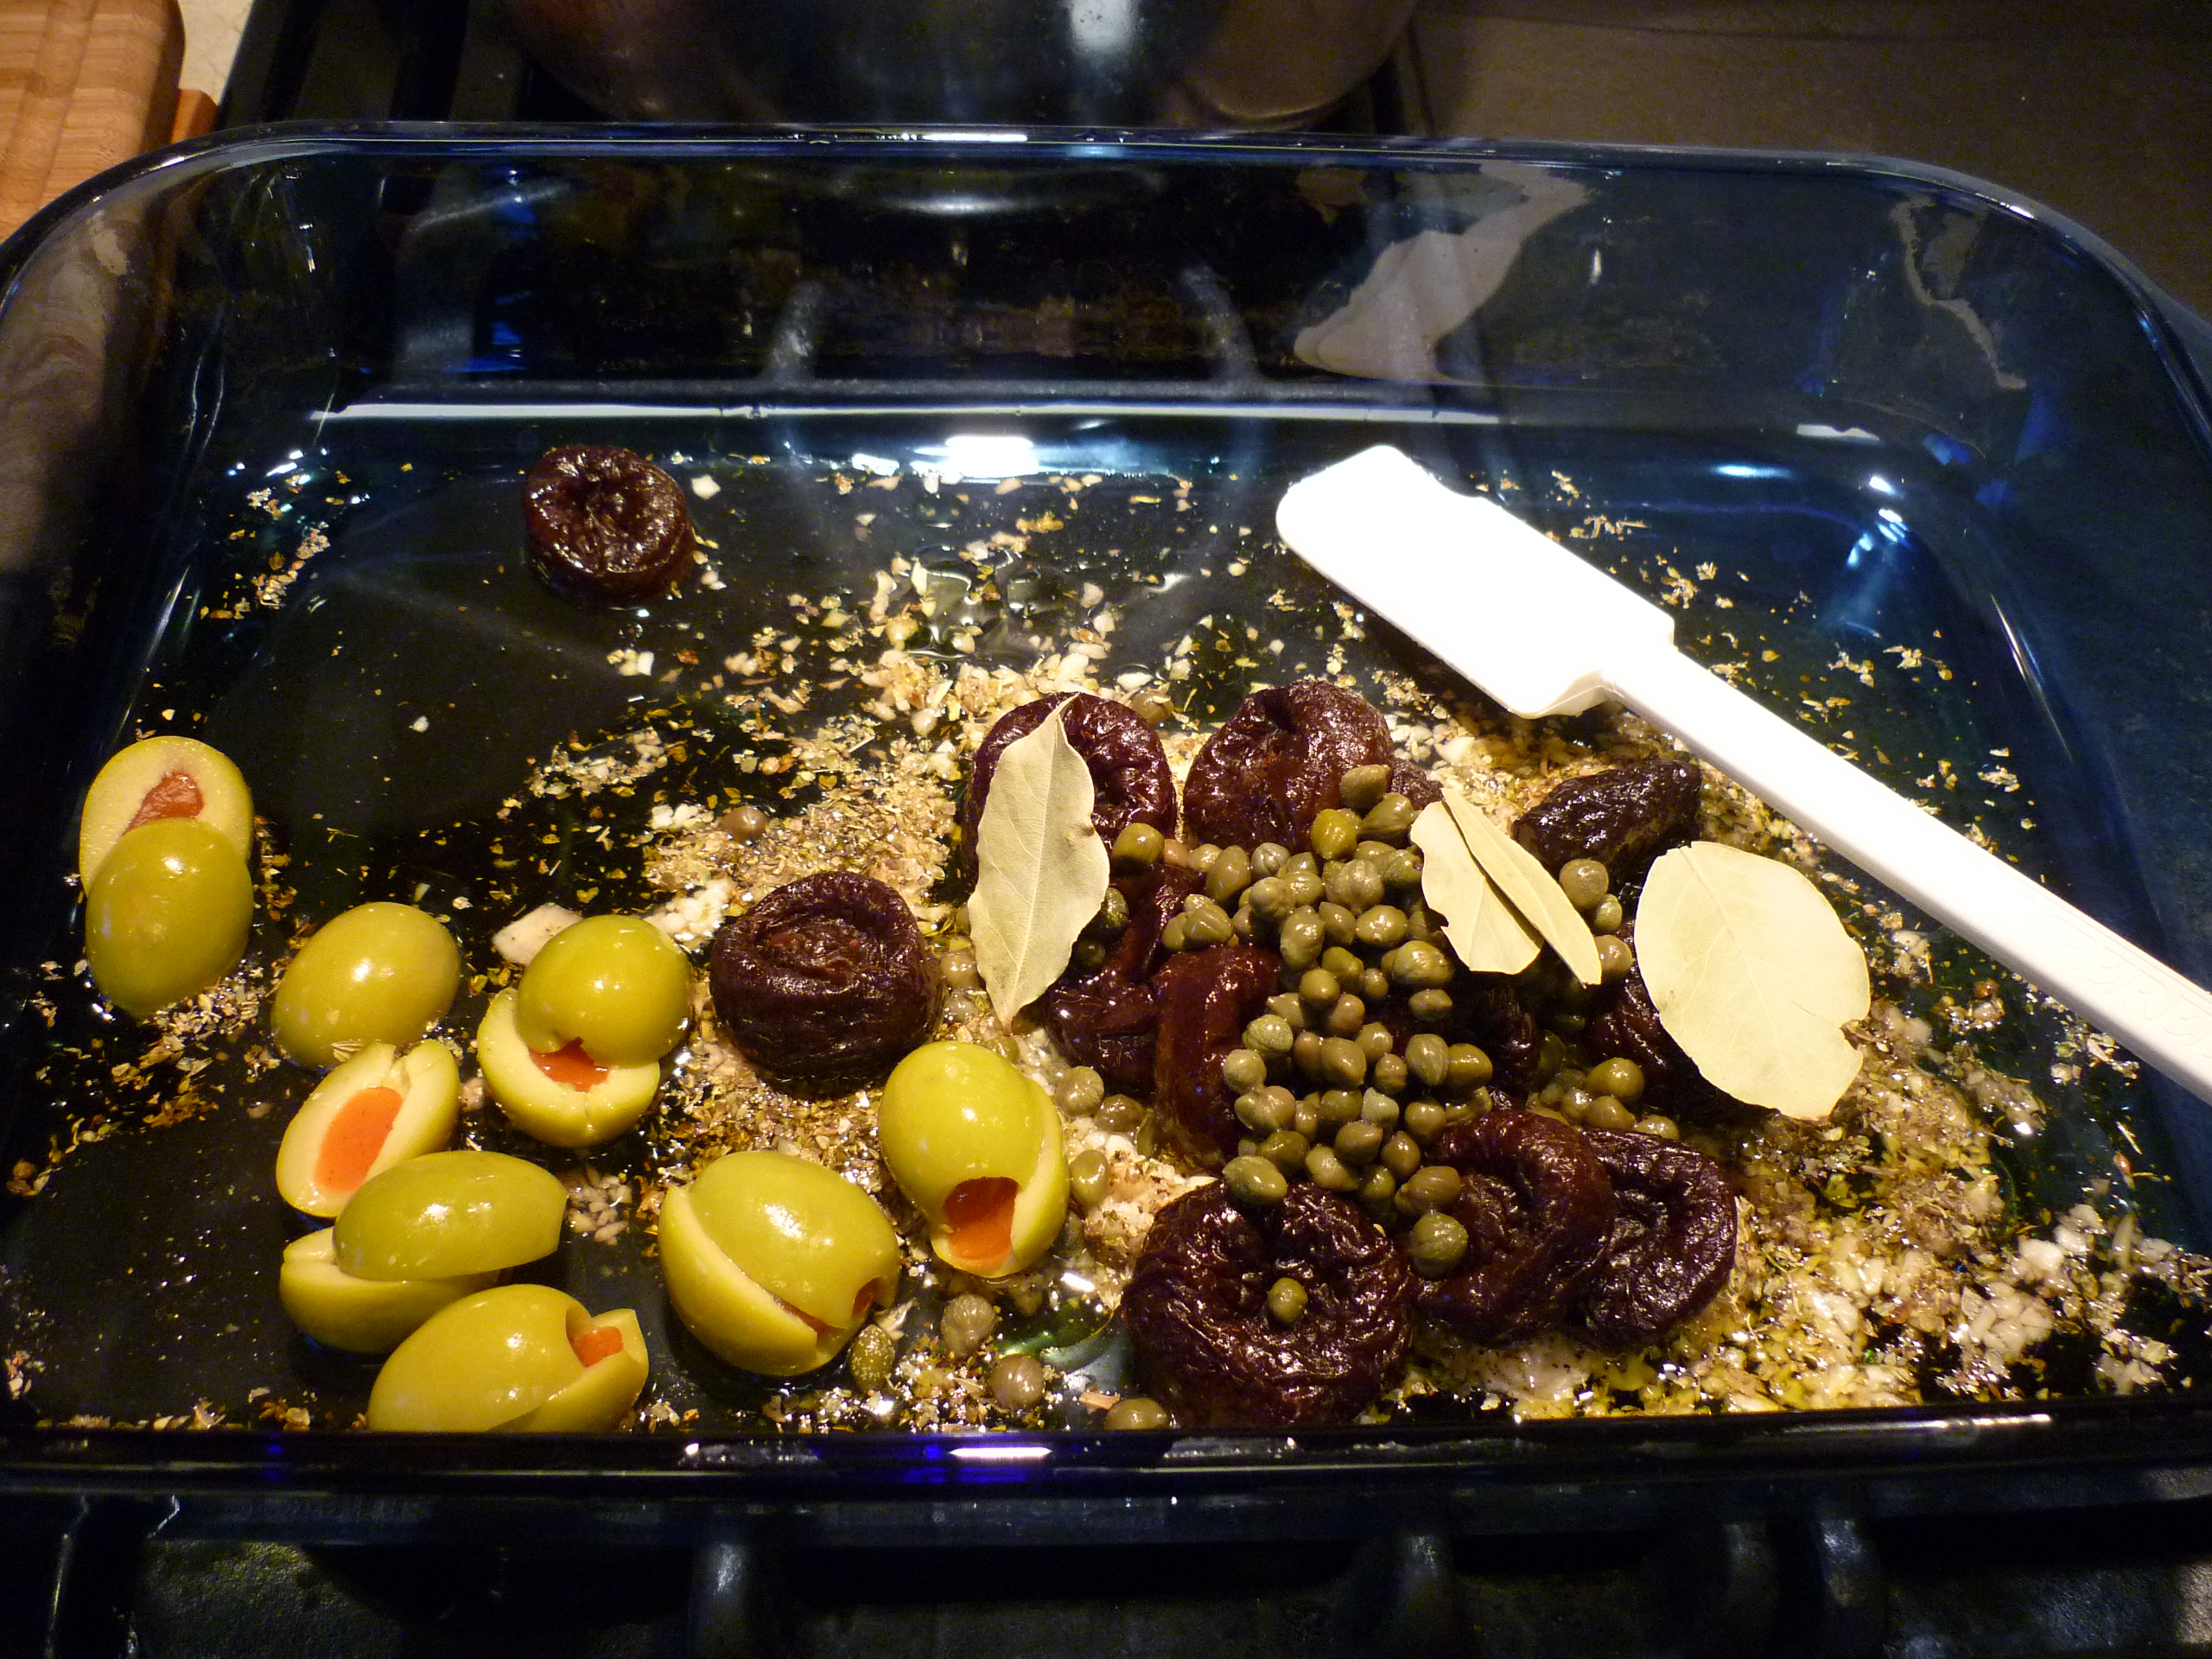 "Into a 9x13"" baking dish, mix together: 2 Tbsp. dried oregano; Salt ..."